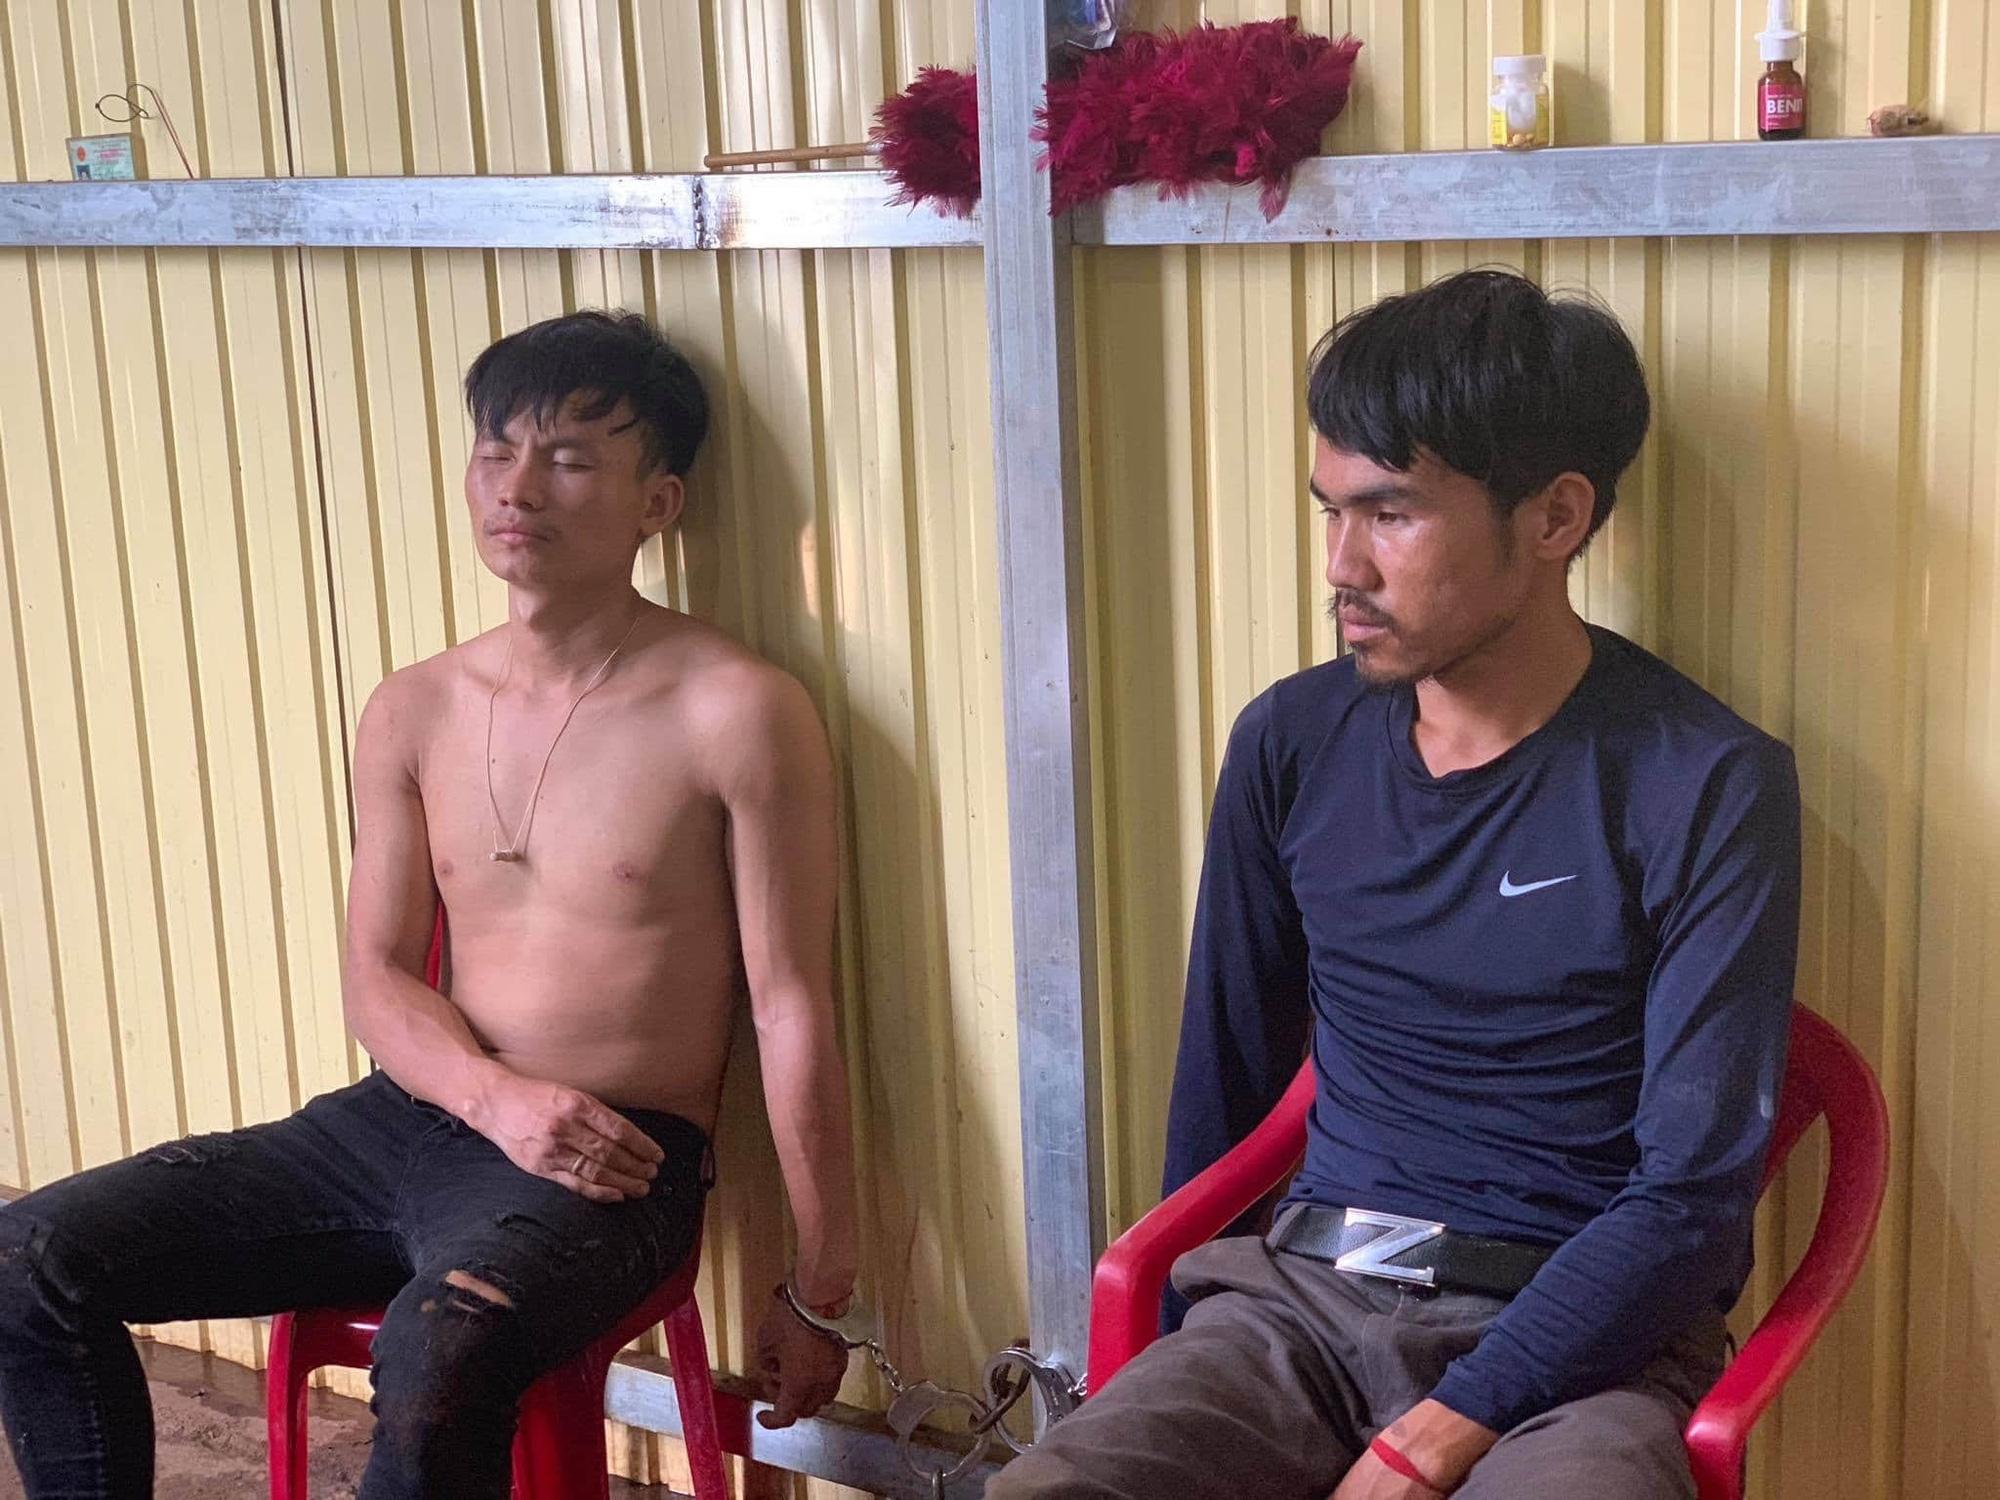 Vu Ba Tenh and Nhia Ho are arrested in Dak Lak Province, Vietnam, July 20, 2020. Photo: Tuoi Tre